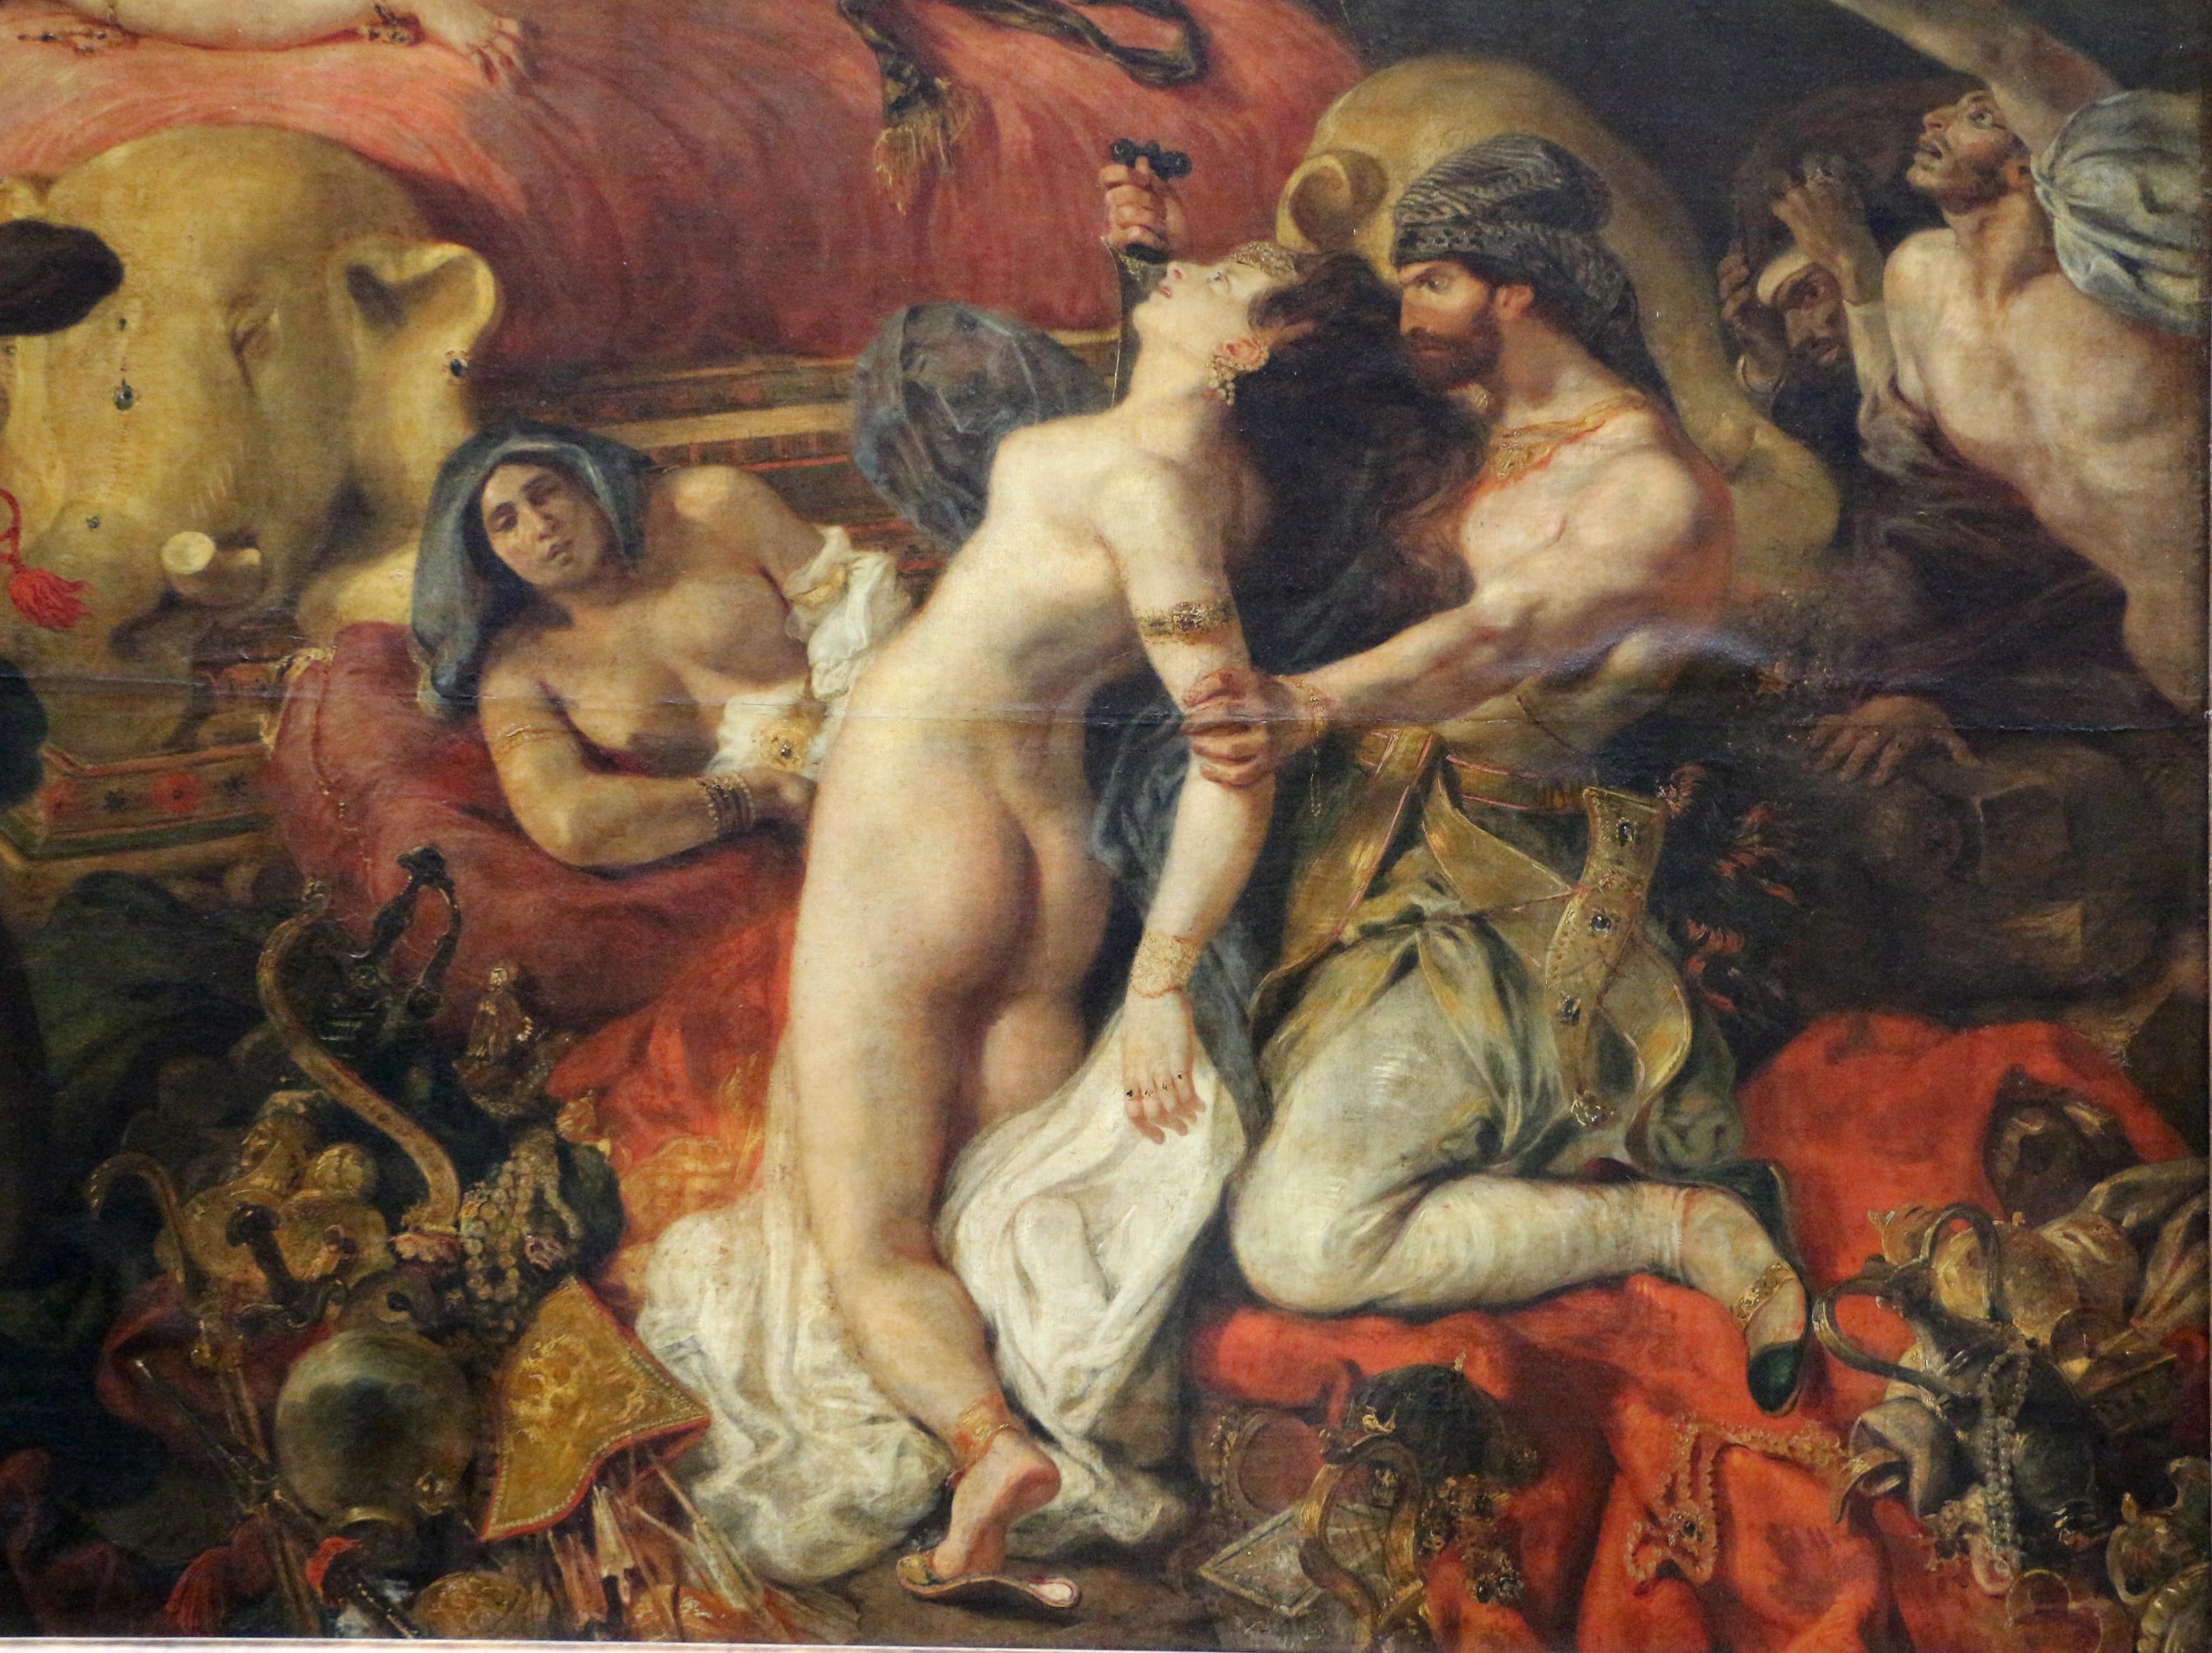 File:Eugène delacroix, la morte di sardanapalo, 1827, 10.jpg